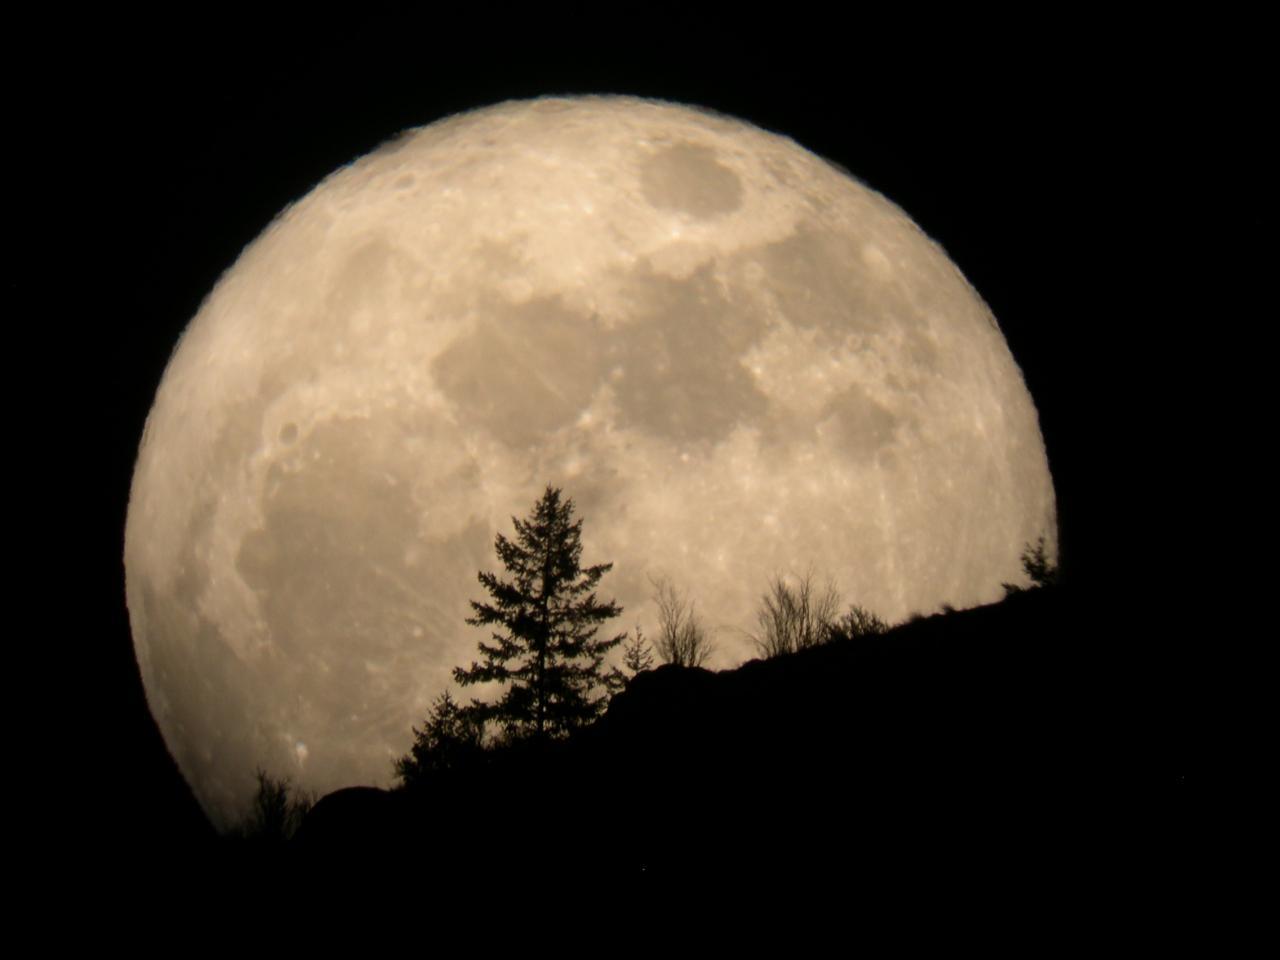 super-moon-2011-tim-mccord-entiat-wash